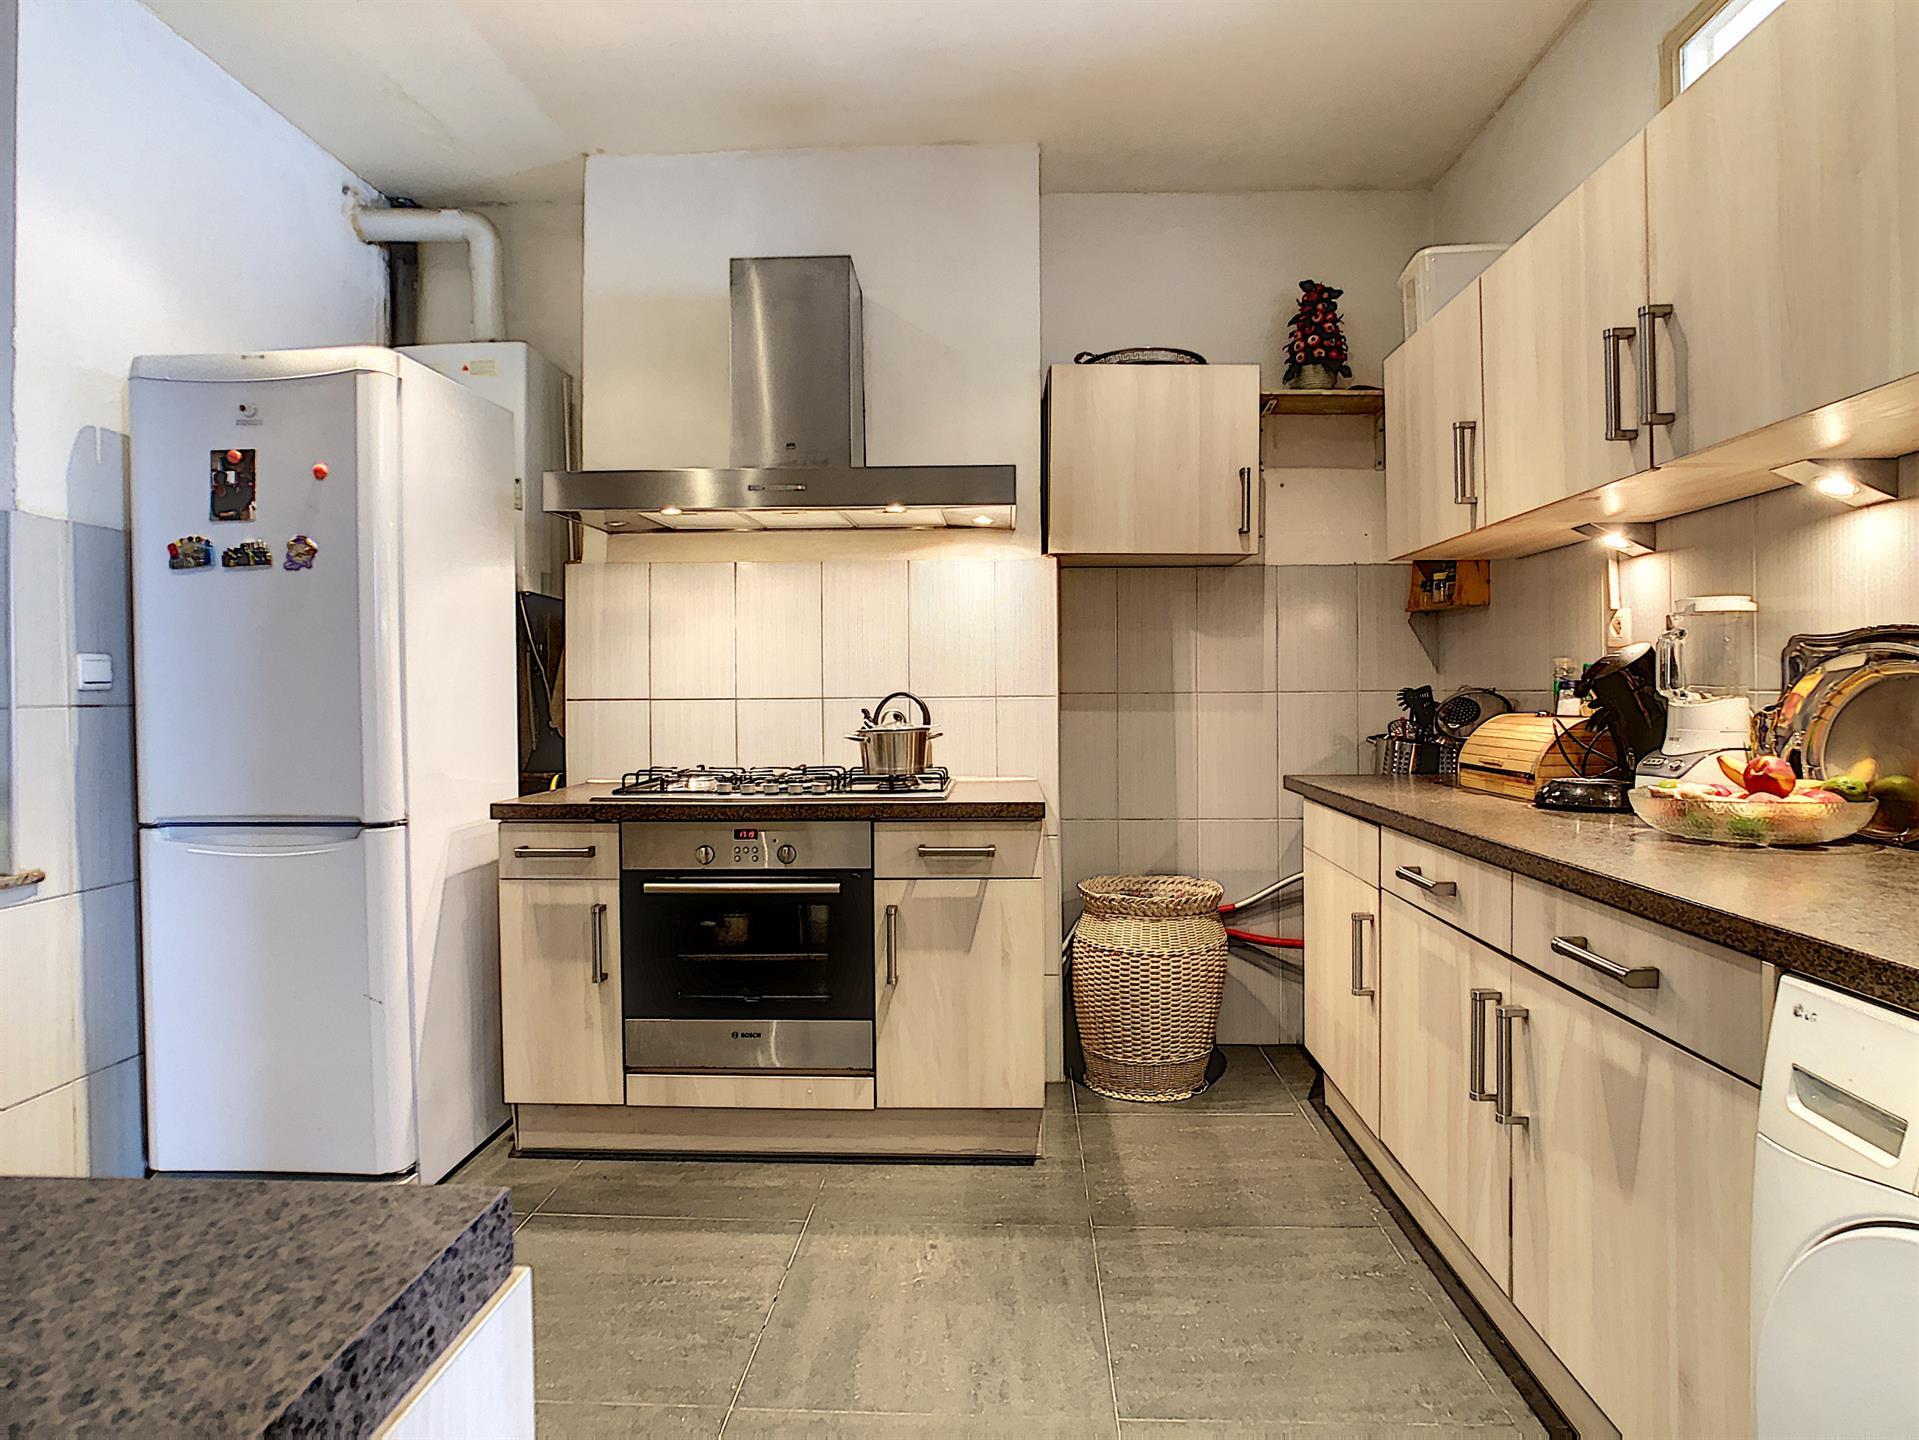 Appartement - Molenbeek-Saint-Jean - #4443903-2